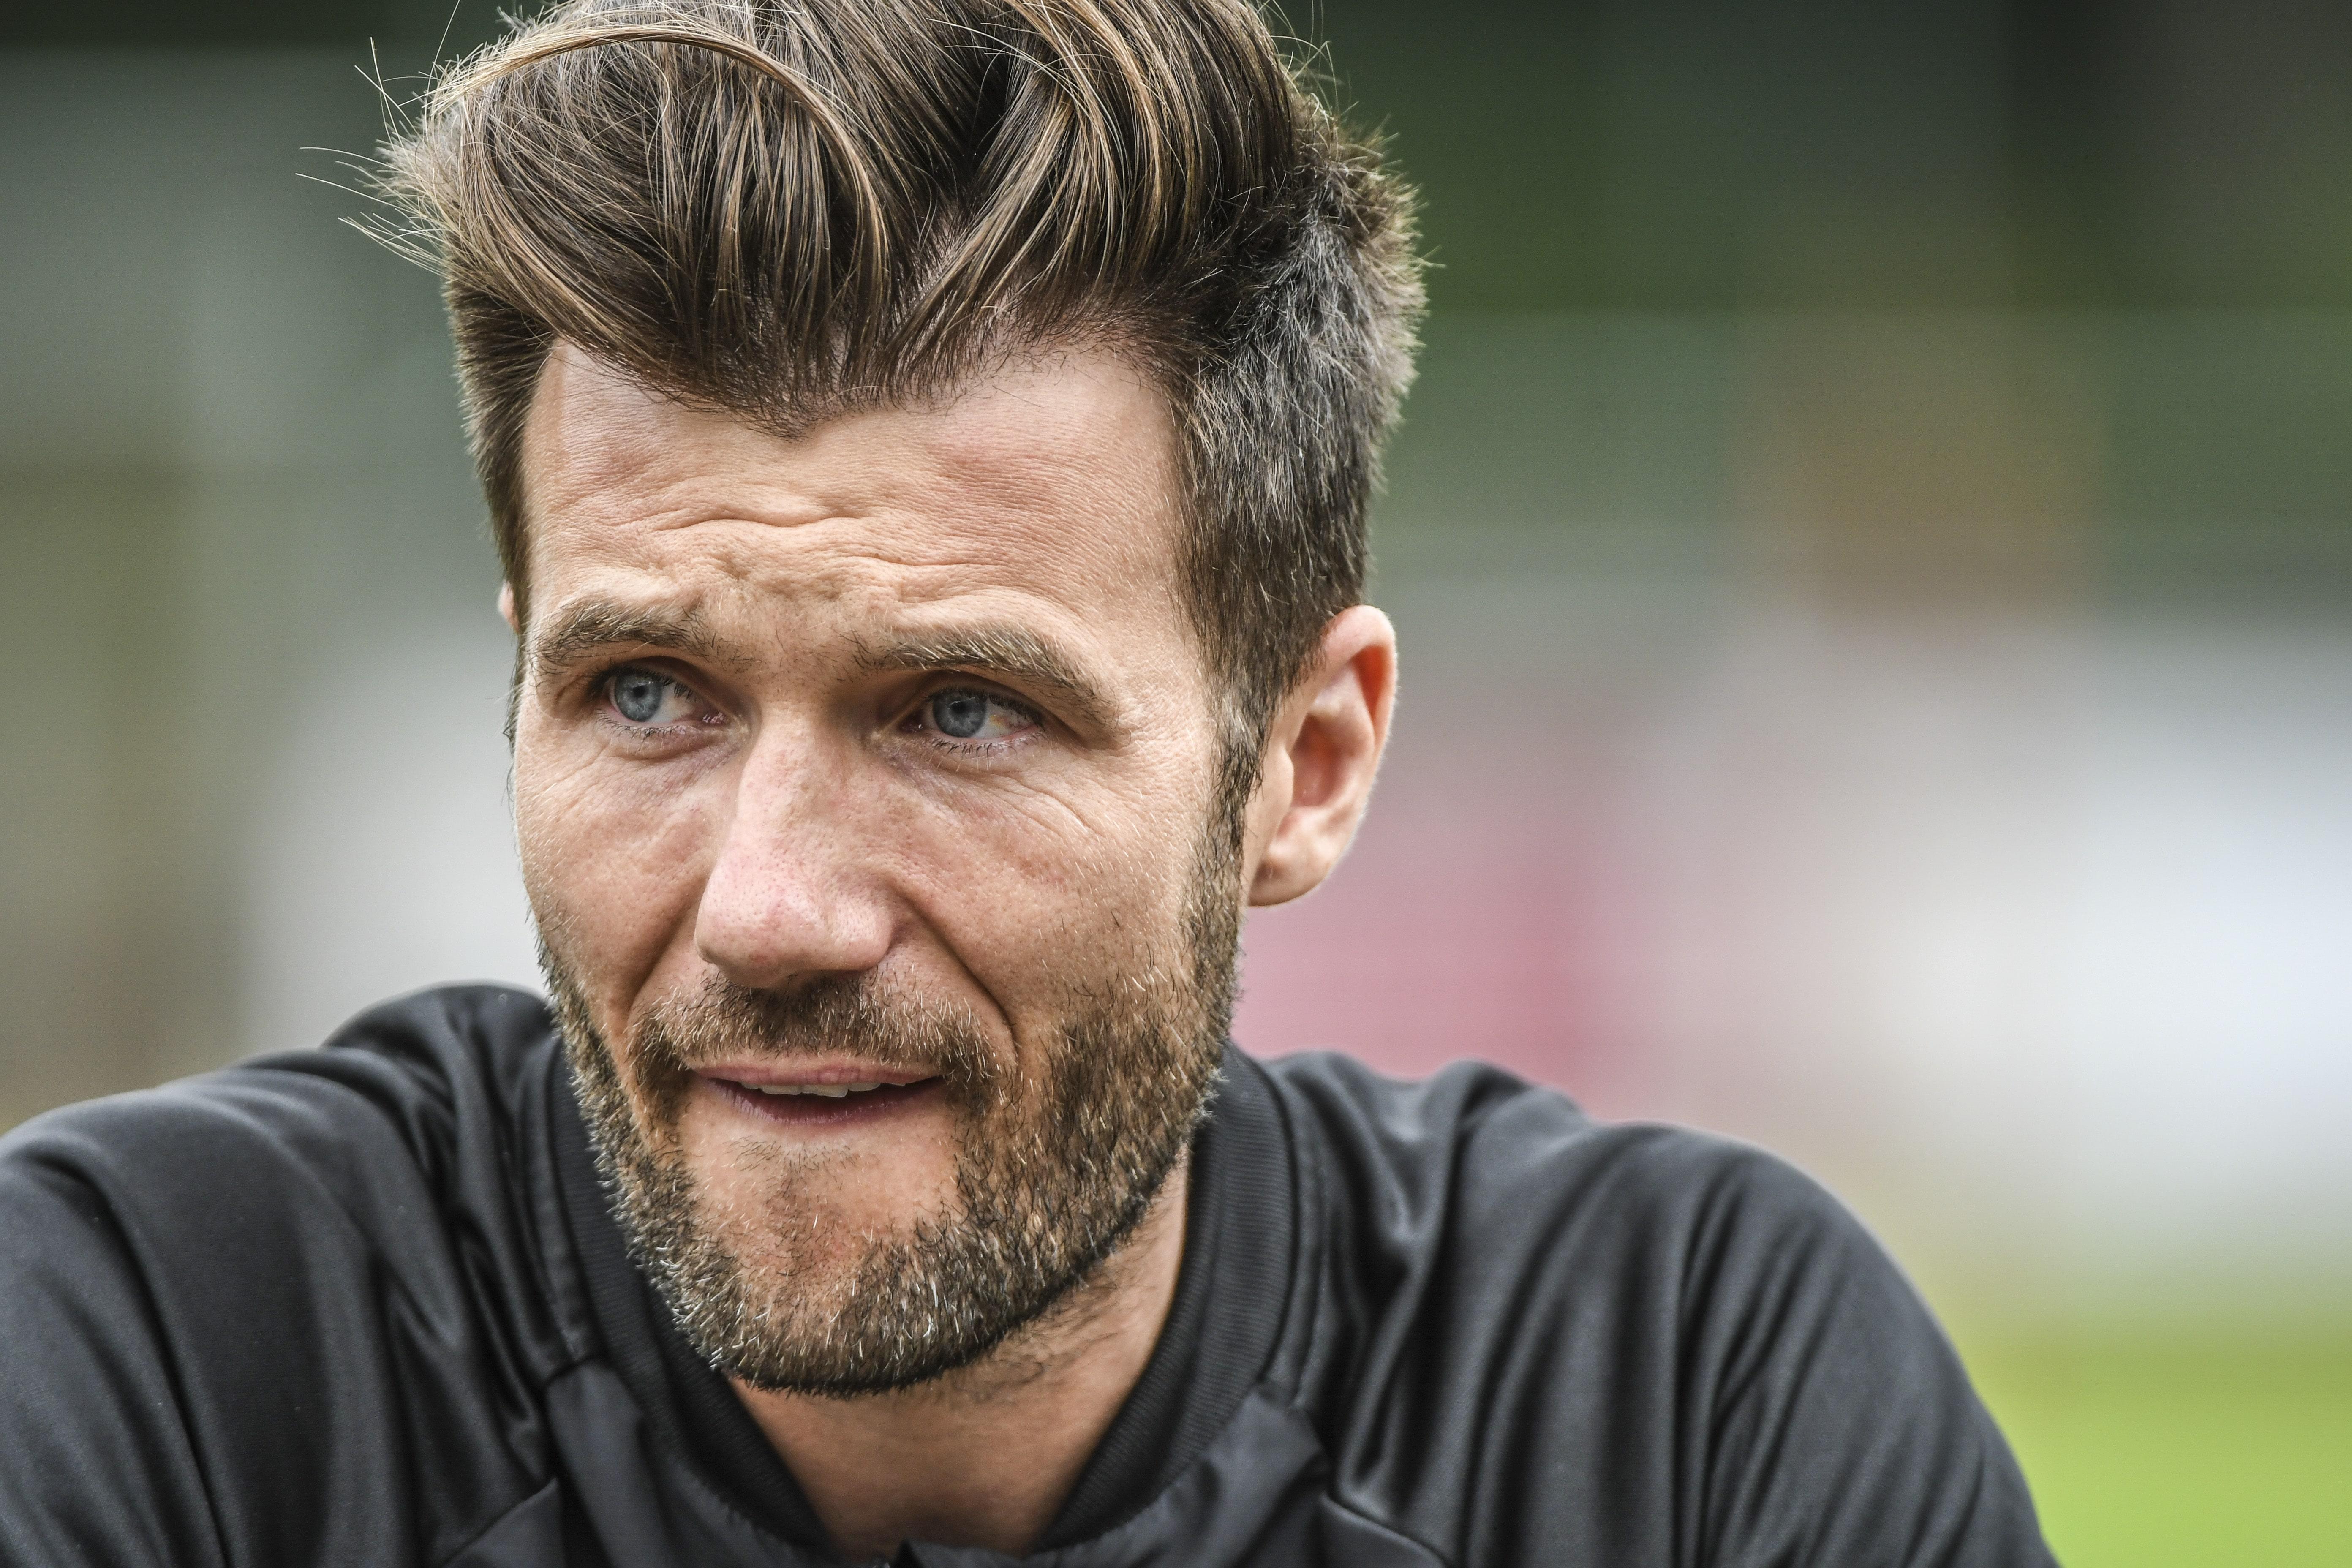 28.06.2017; Rottach-Egern; FUSSBALL SUPER LEAGUE - FC Basel Trainingslager - Training; Trainer Raphael Wicky (Basel) (Andy